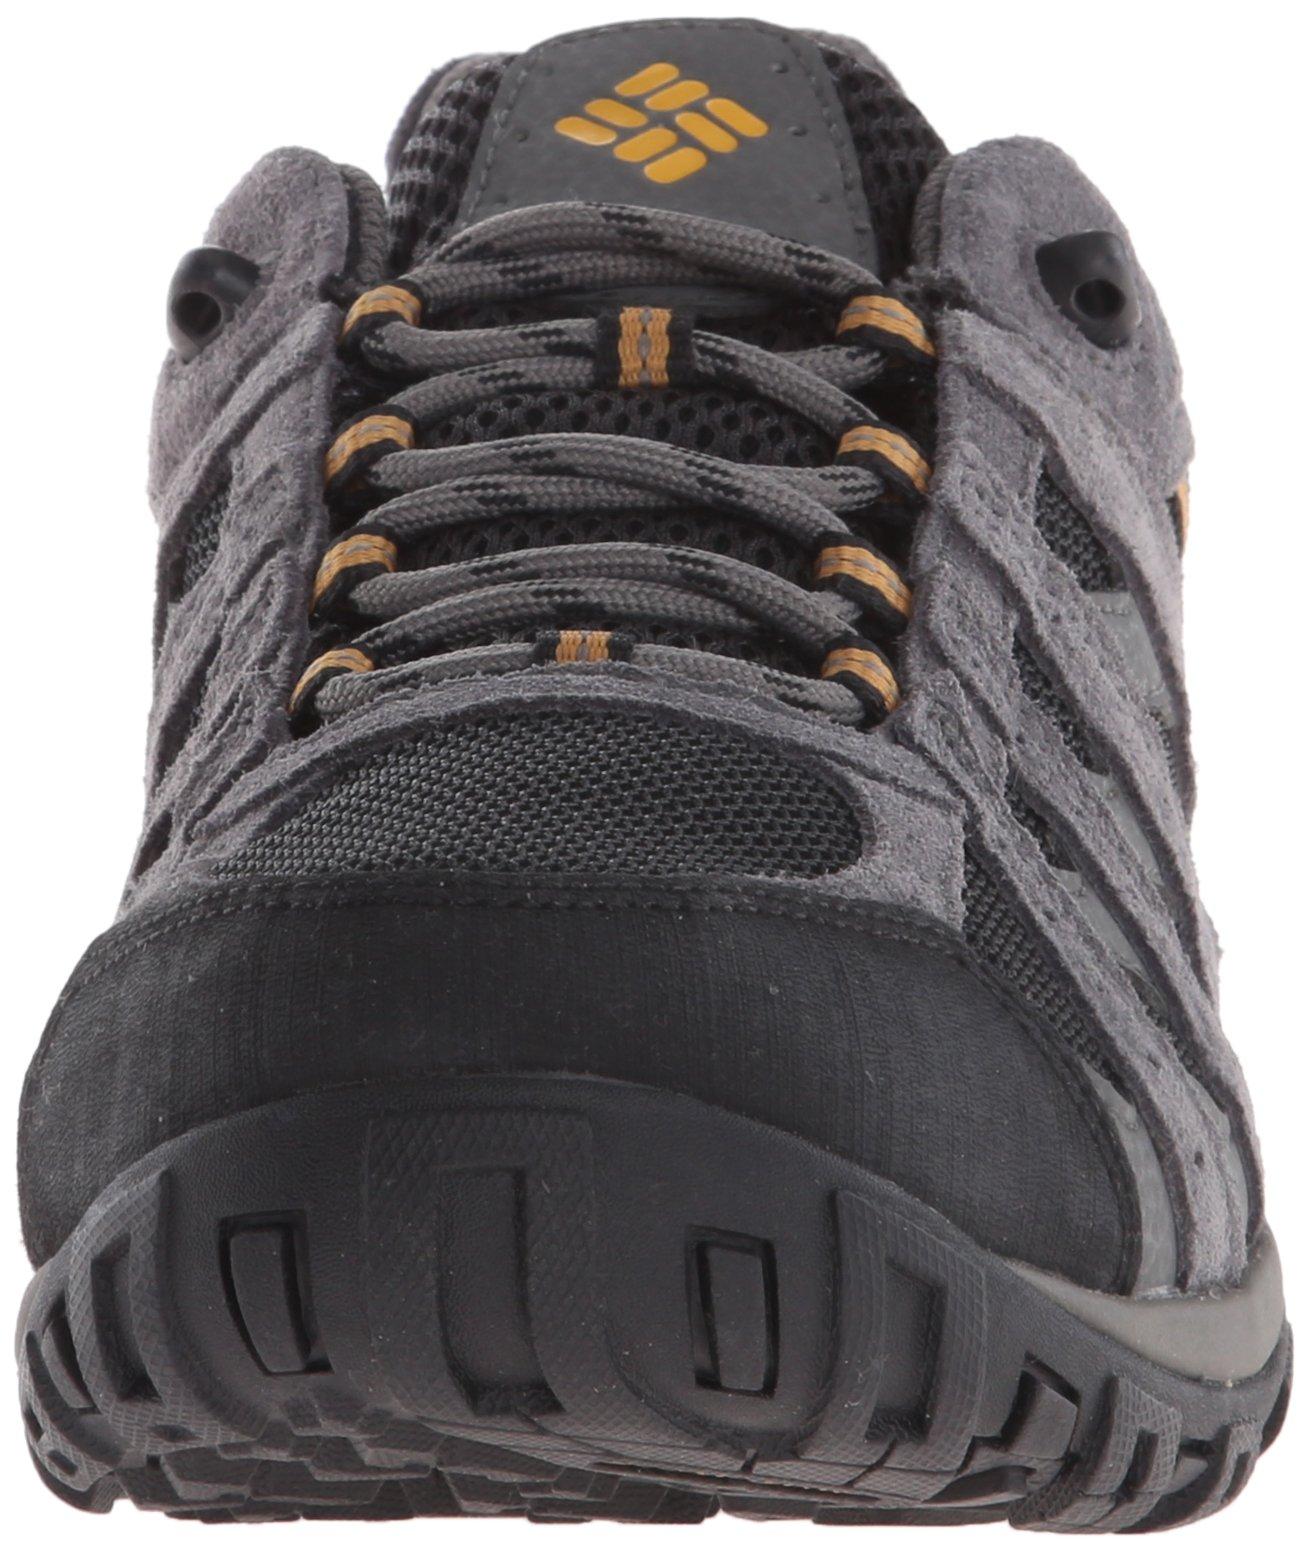 Columbia Men's Redmond Waterproof Hiking Shoe Black, Squash 7.5 D US by Columbia (Image #4)